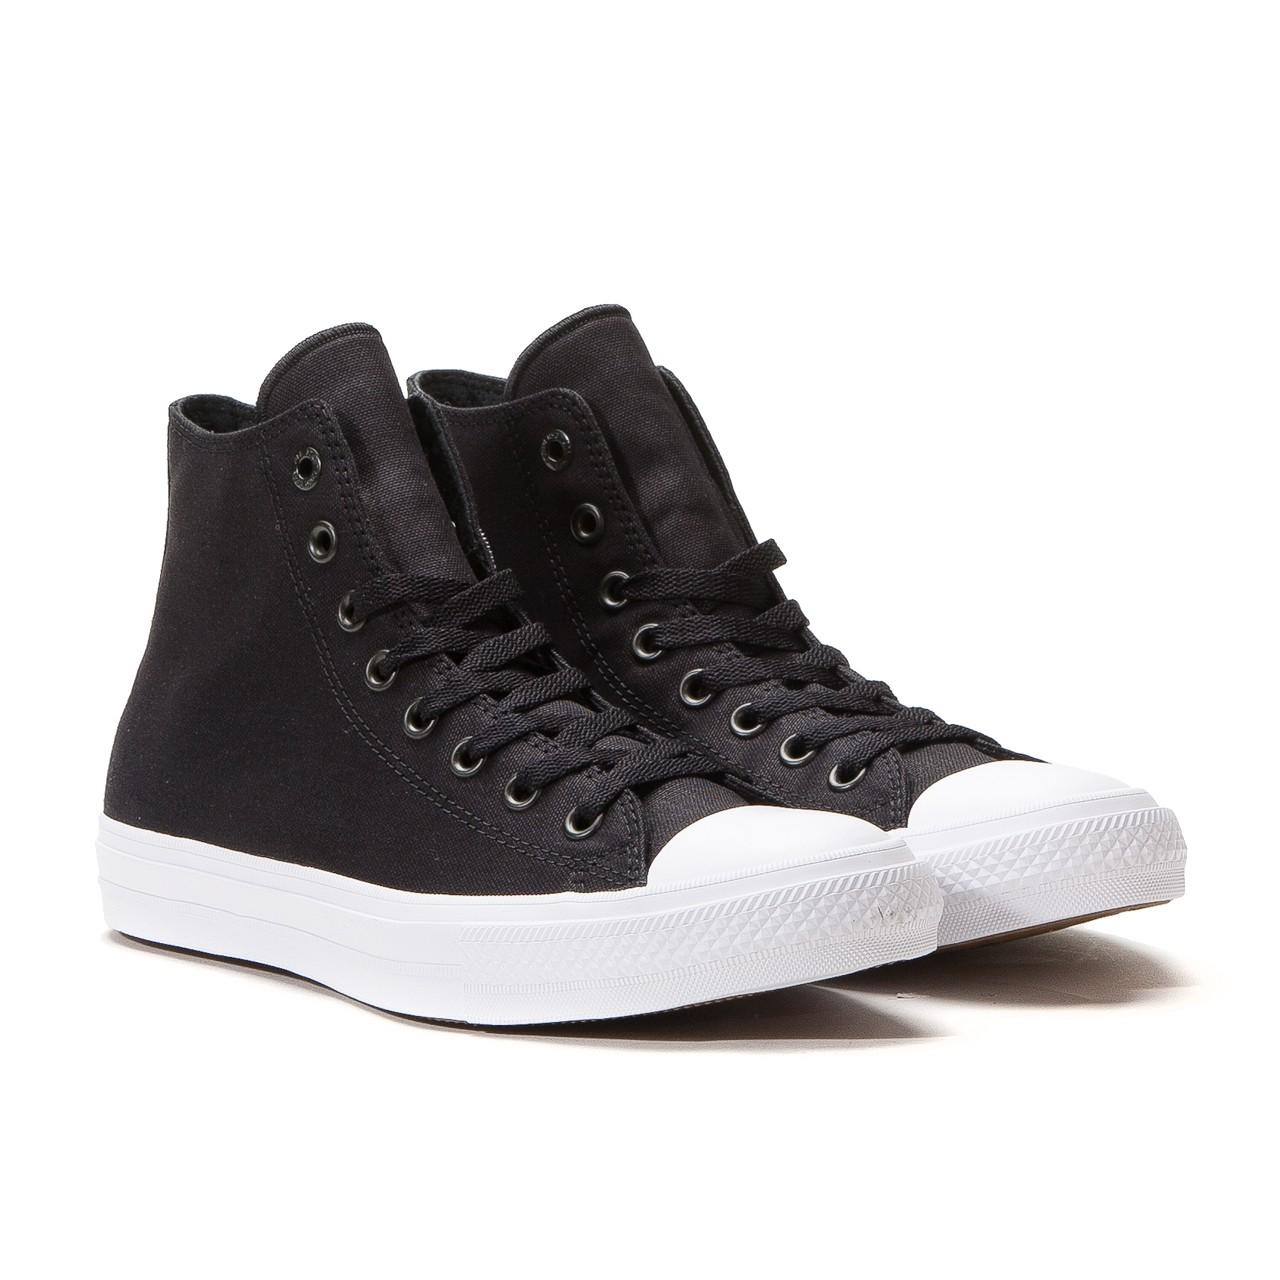 converse chuck taylor ii hi black white 2 1